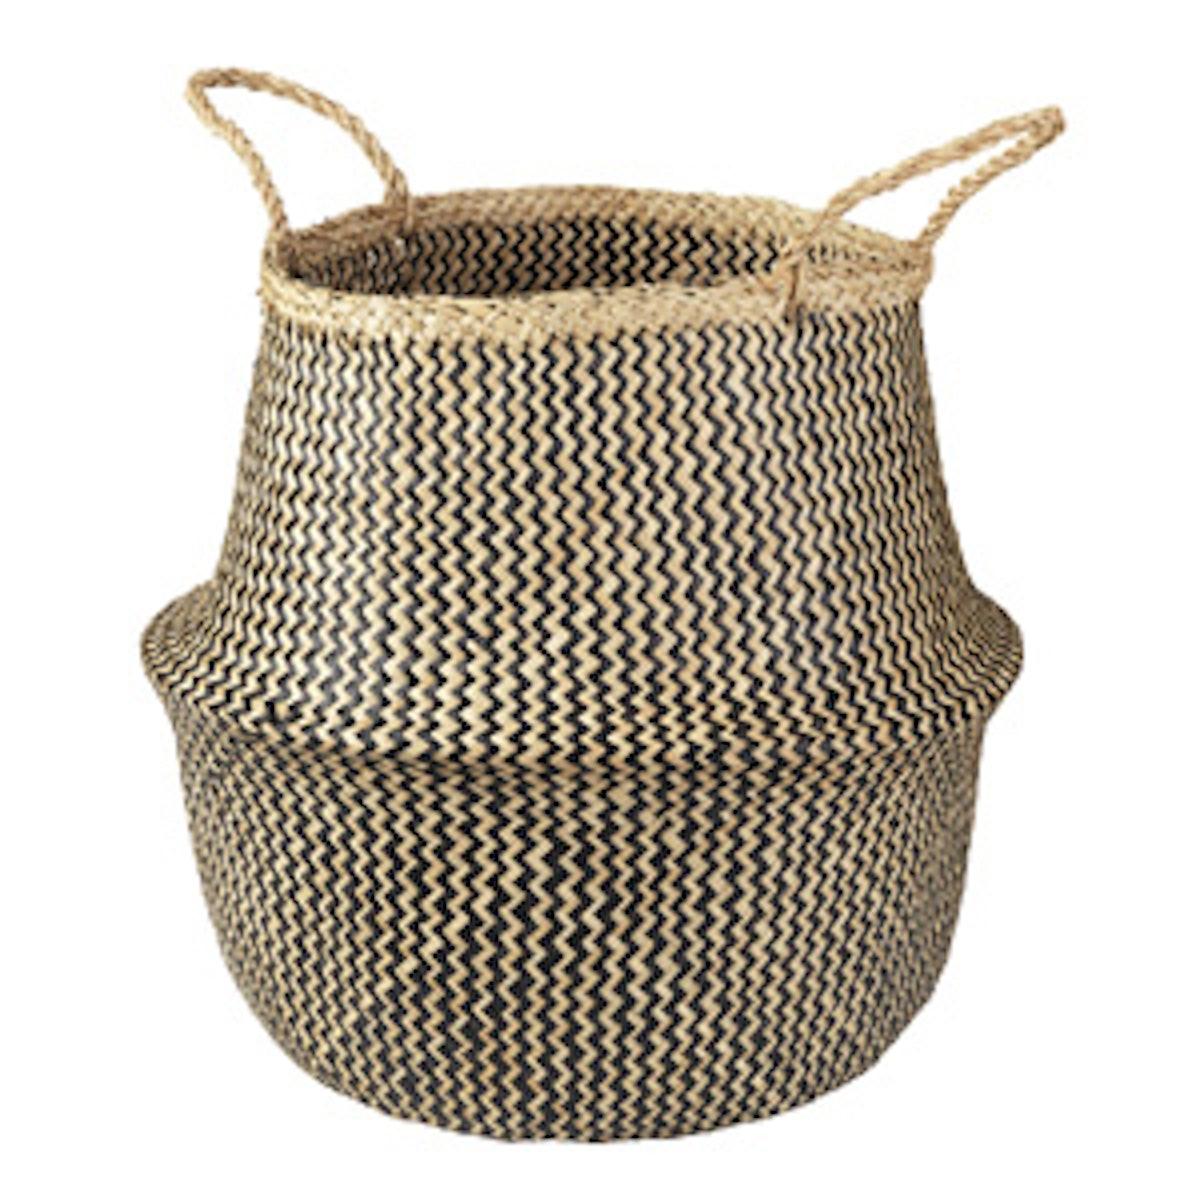 Basket in Seagrass/Black